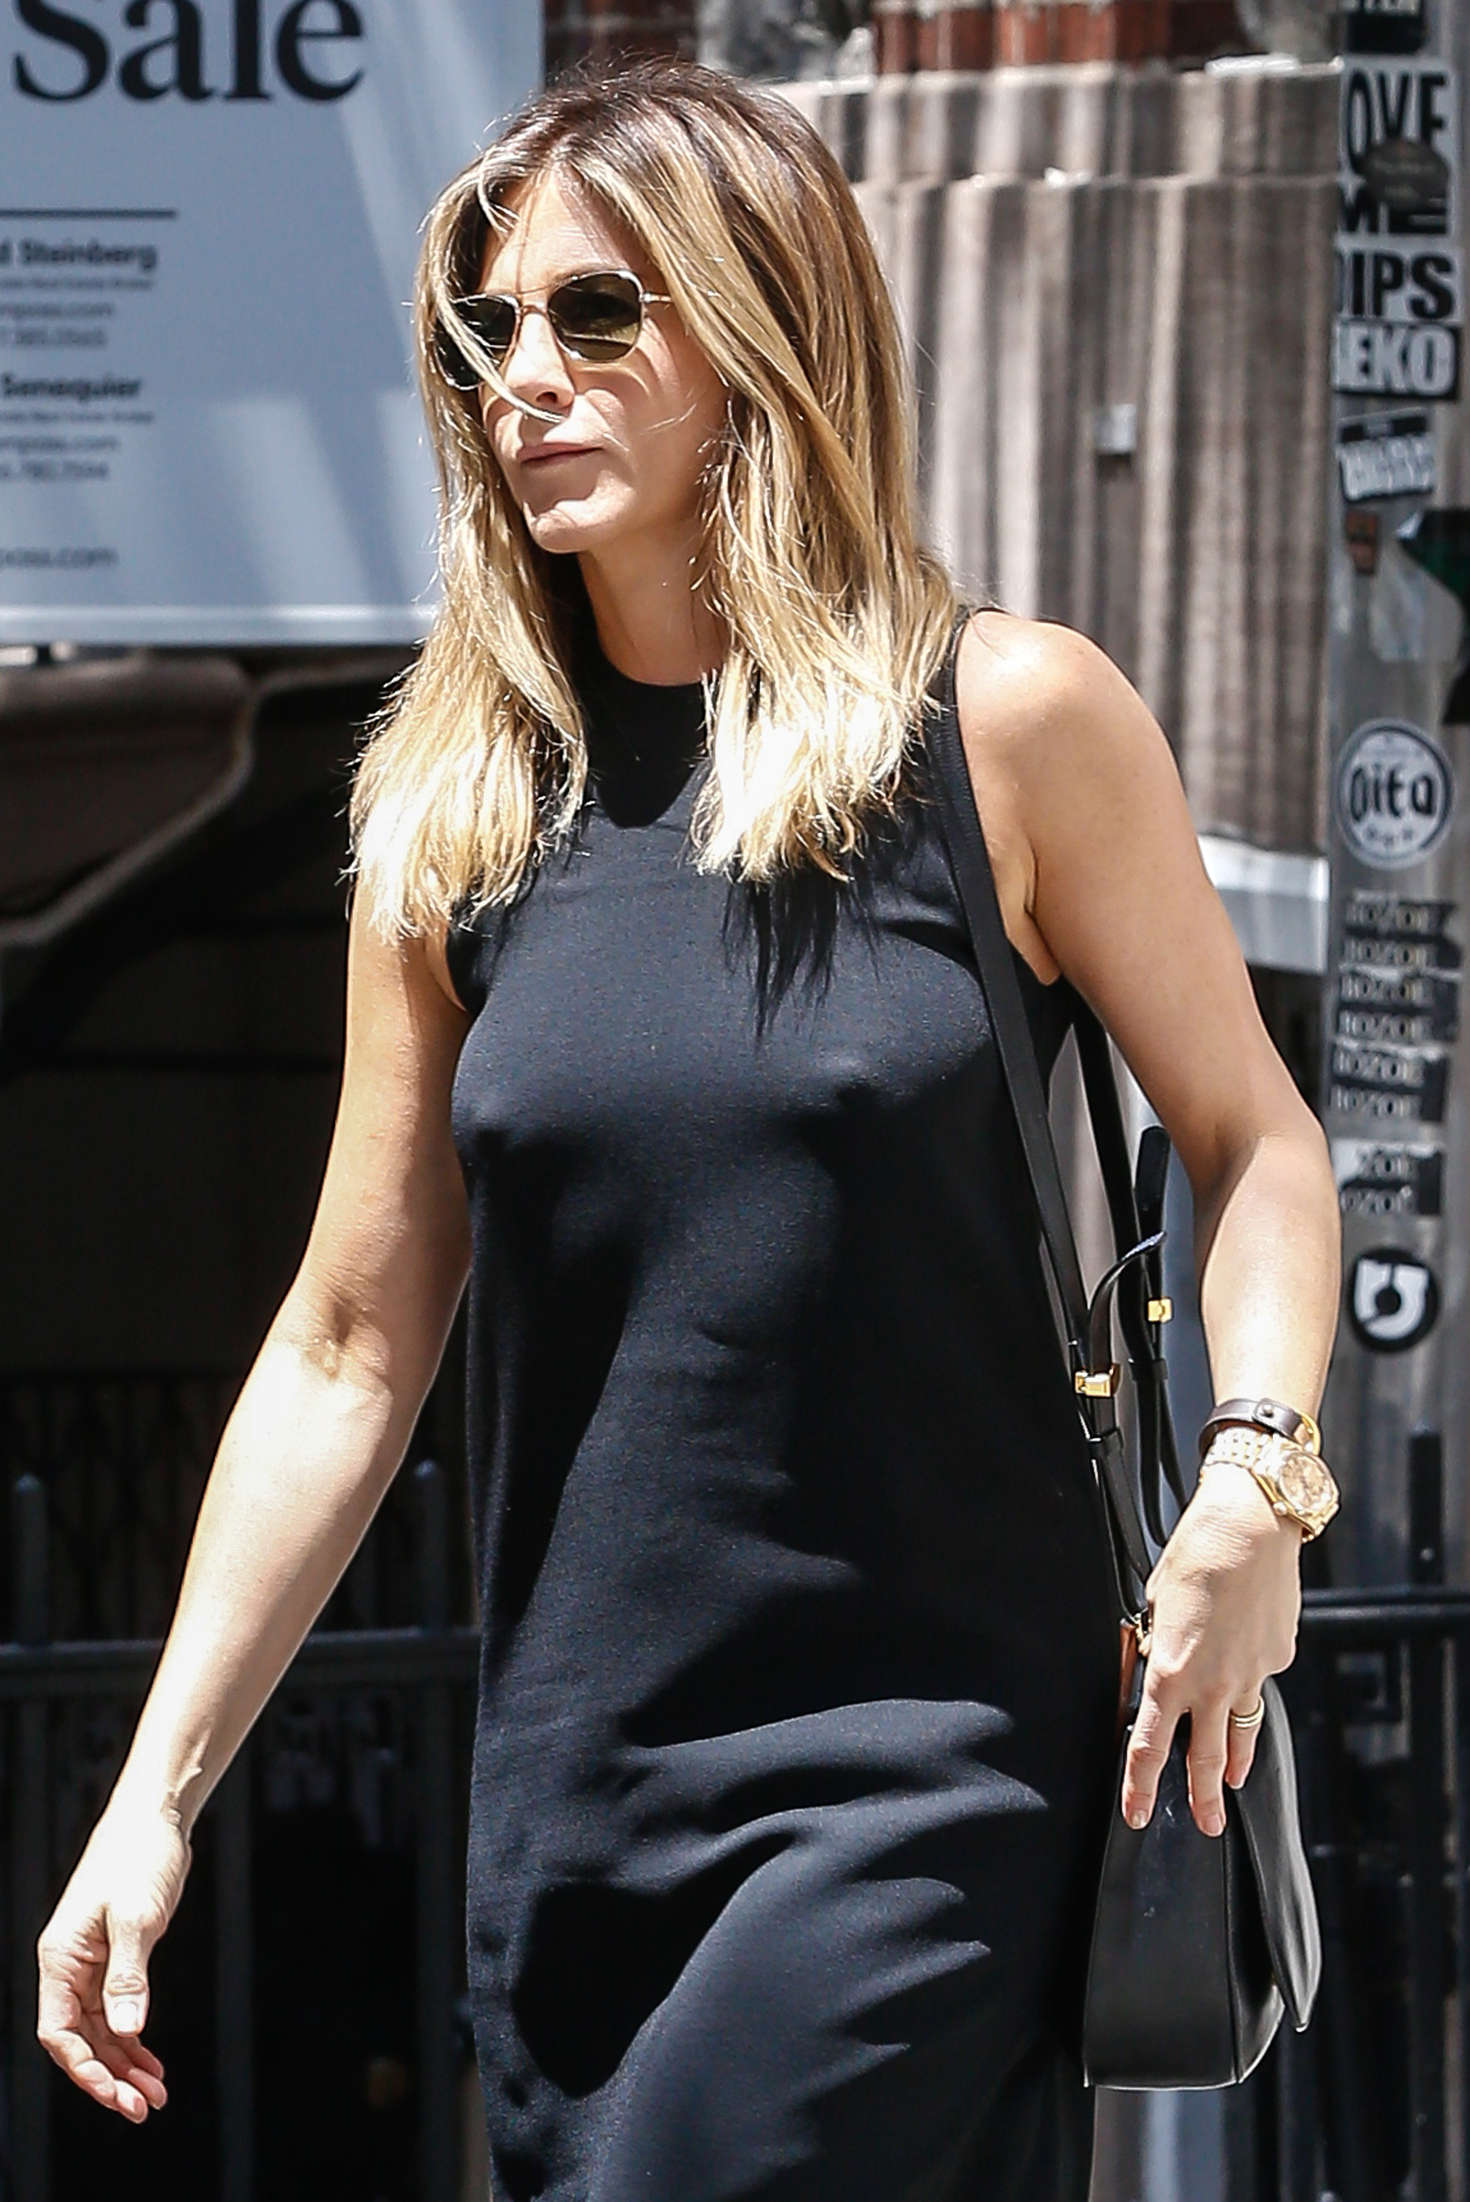 Jennifer aniston nipples